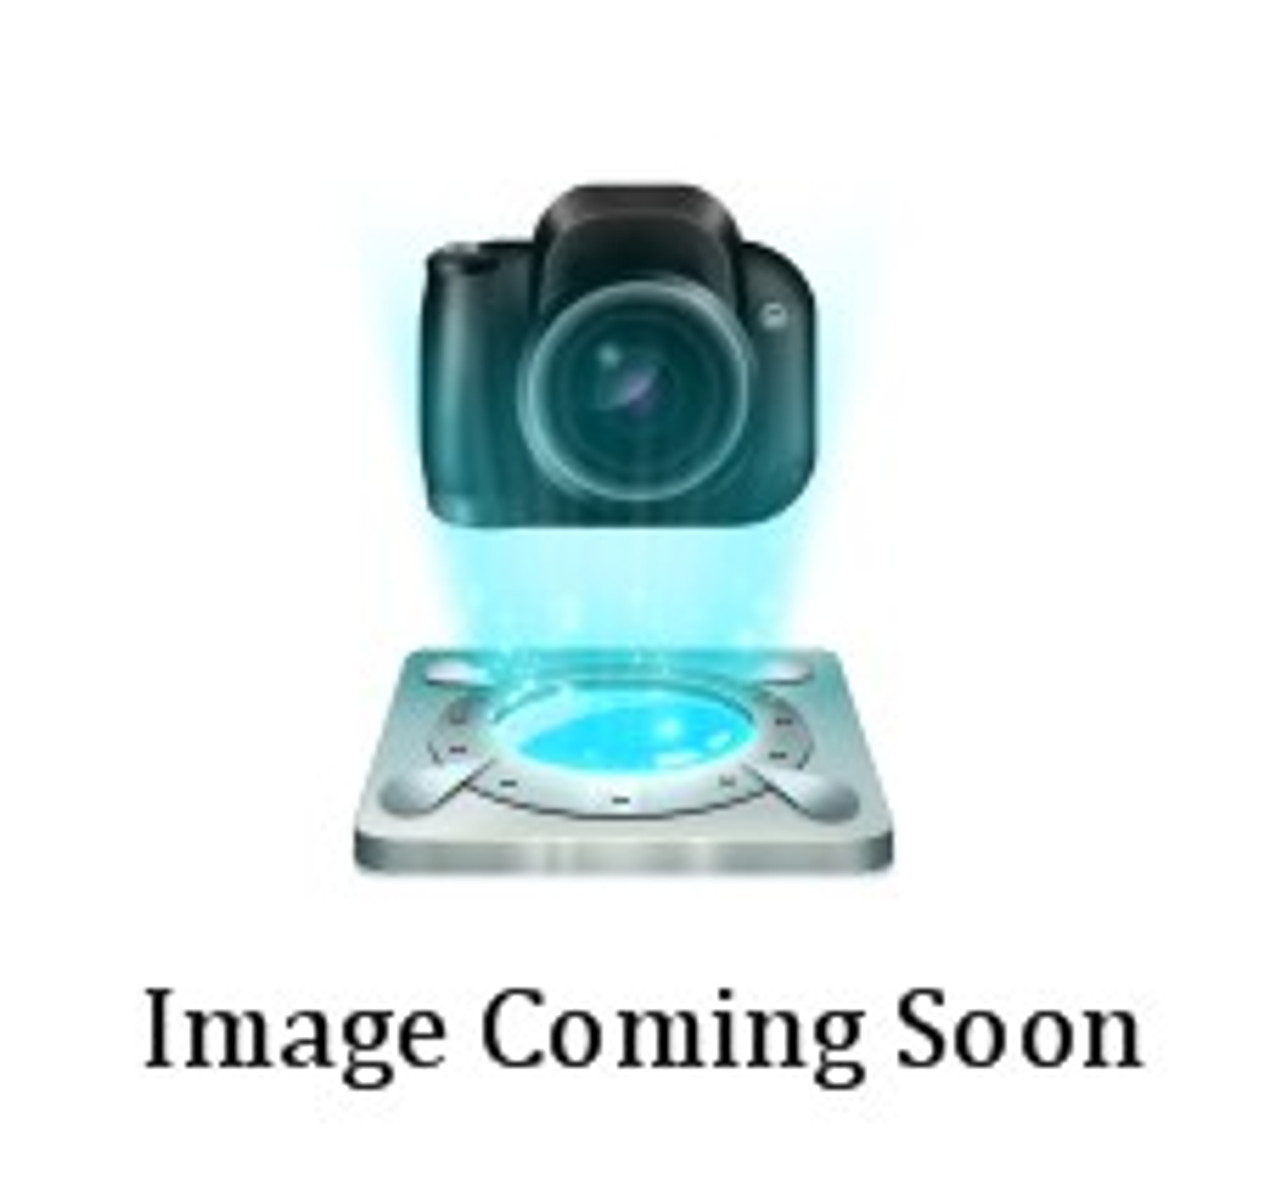 ELO 1523L/1723L Touchscreen Monitor Mounting Kit, Black, E808749